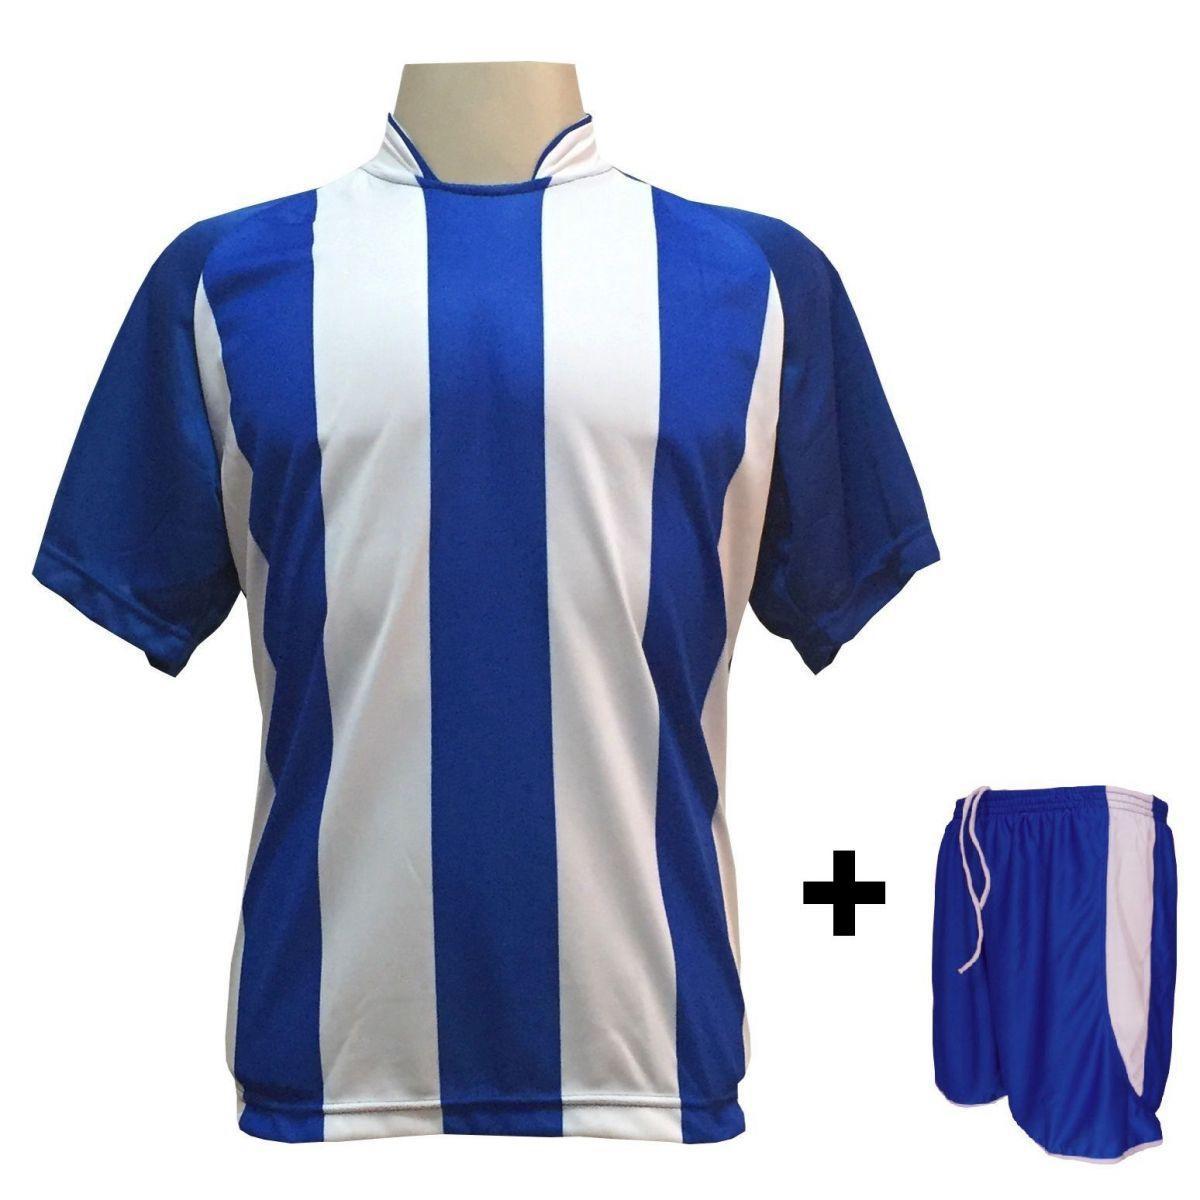 a26b21608a Uniforme Esportivo com 12 Camisas modelo Milan Royal Branco + 12 Calções  modelo Copa Royal Branco - Play fair - Futebol - Magazine Luiza